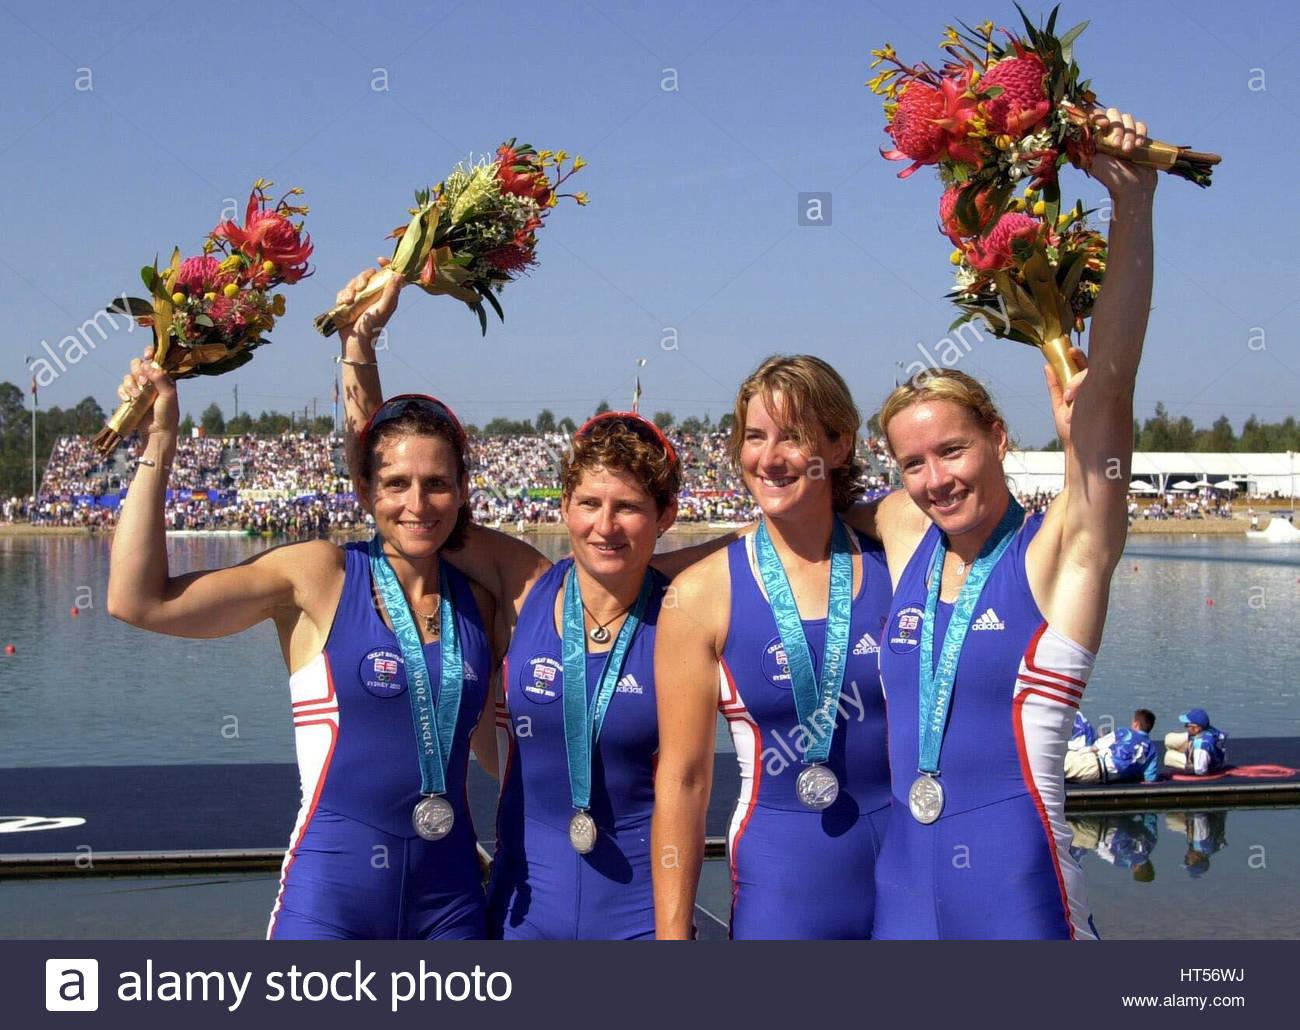 Atleti olimpici datati